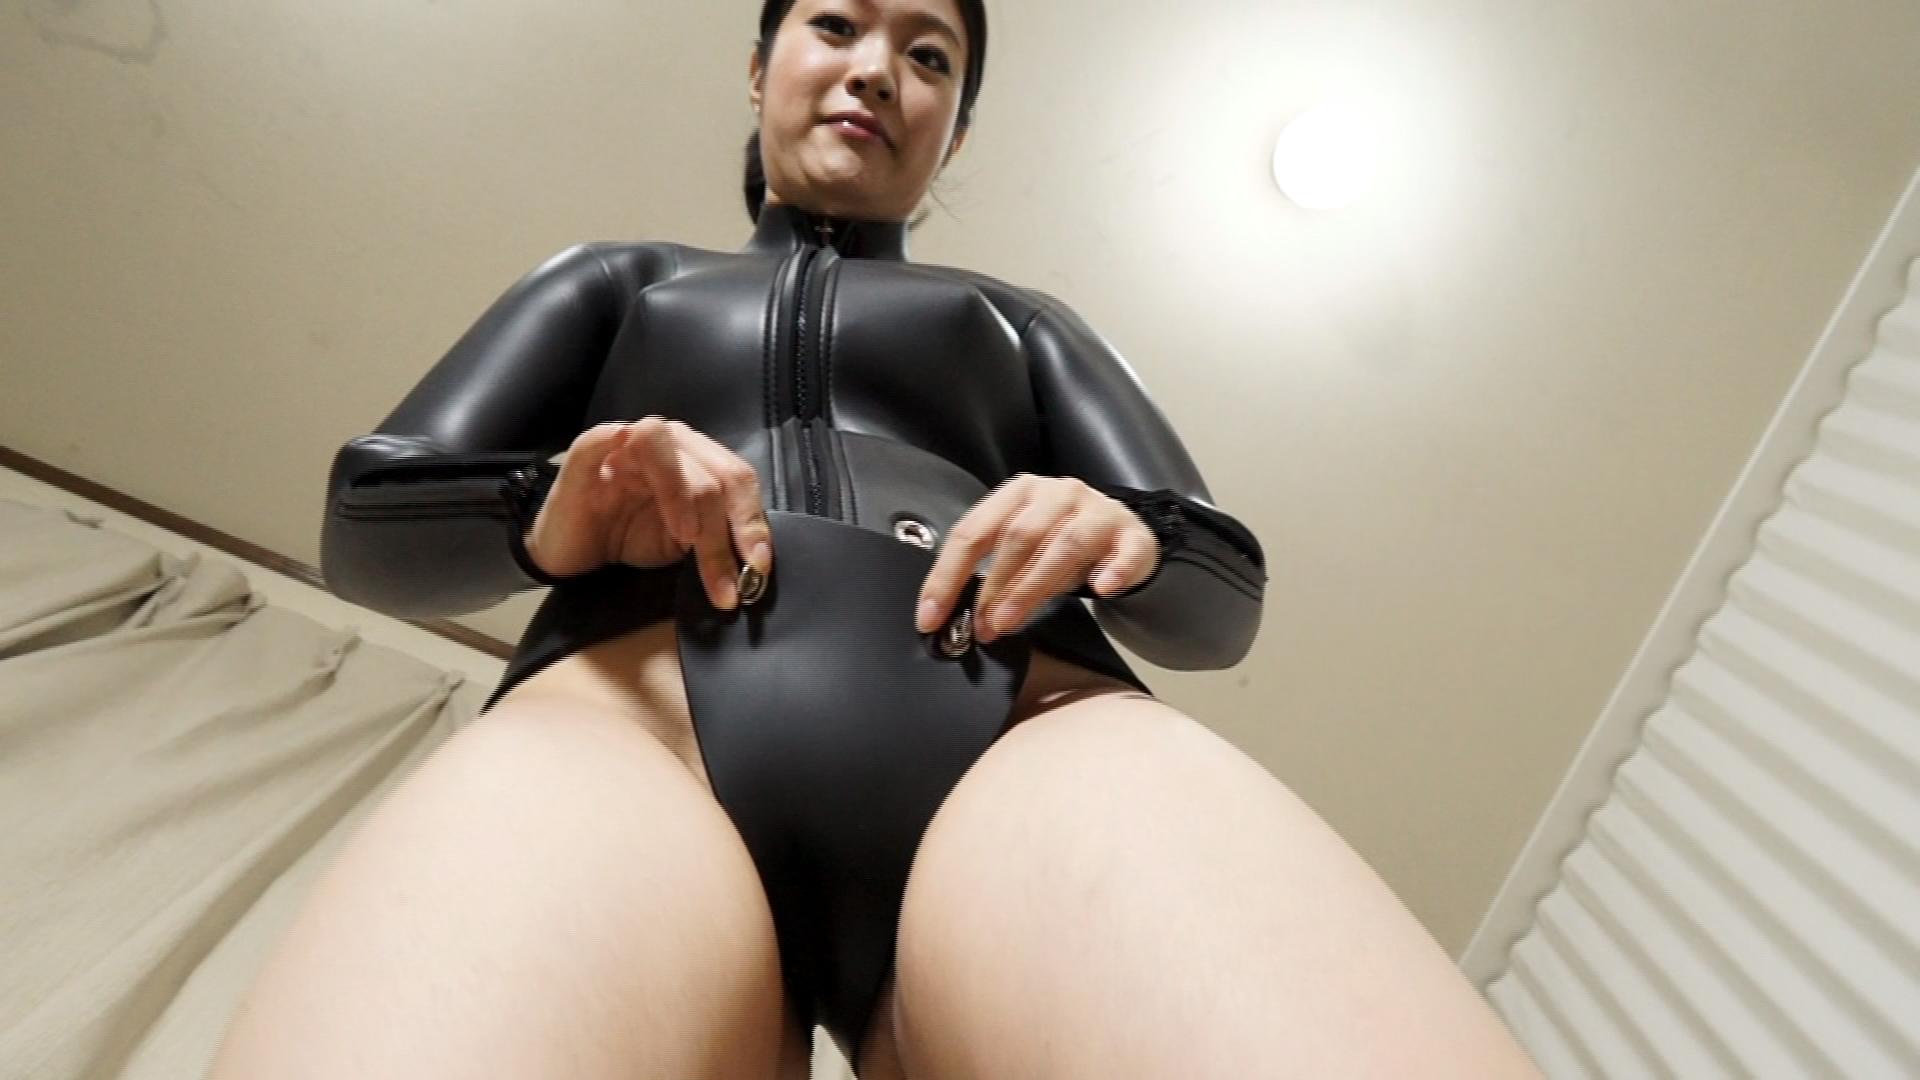 Erotic imagination on vimeo